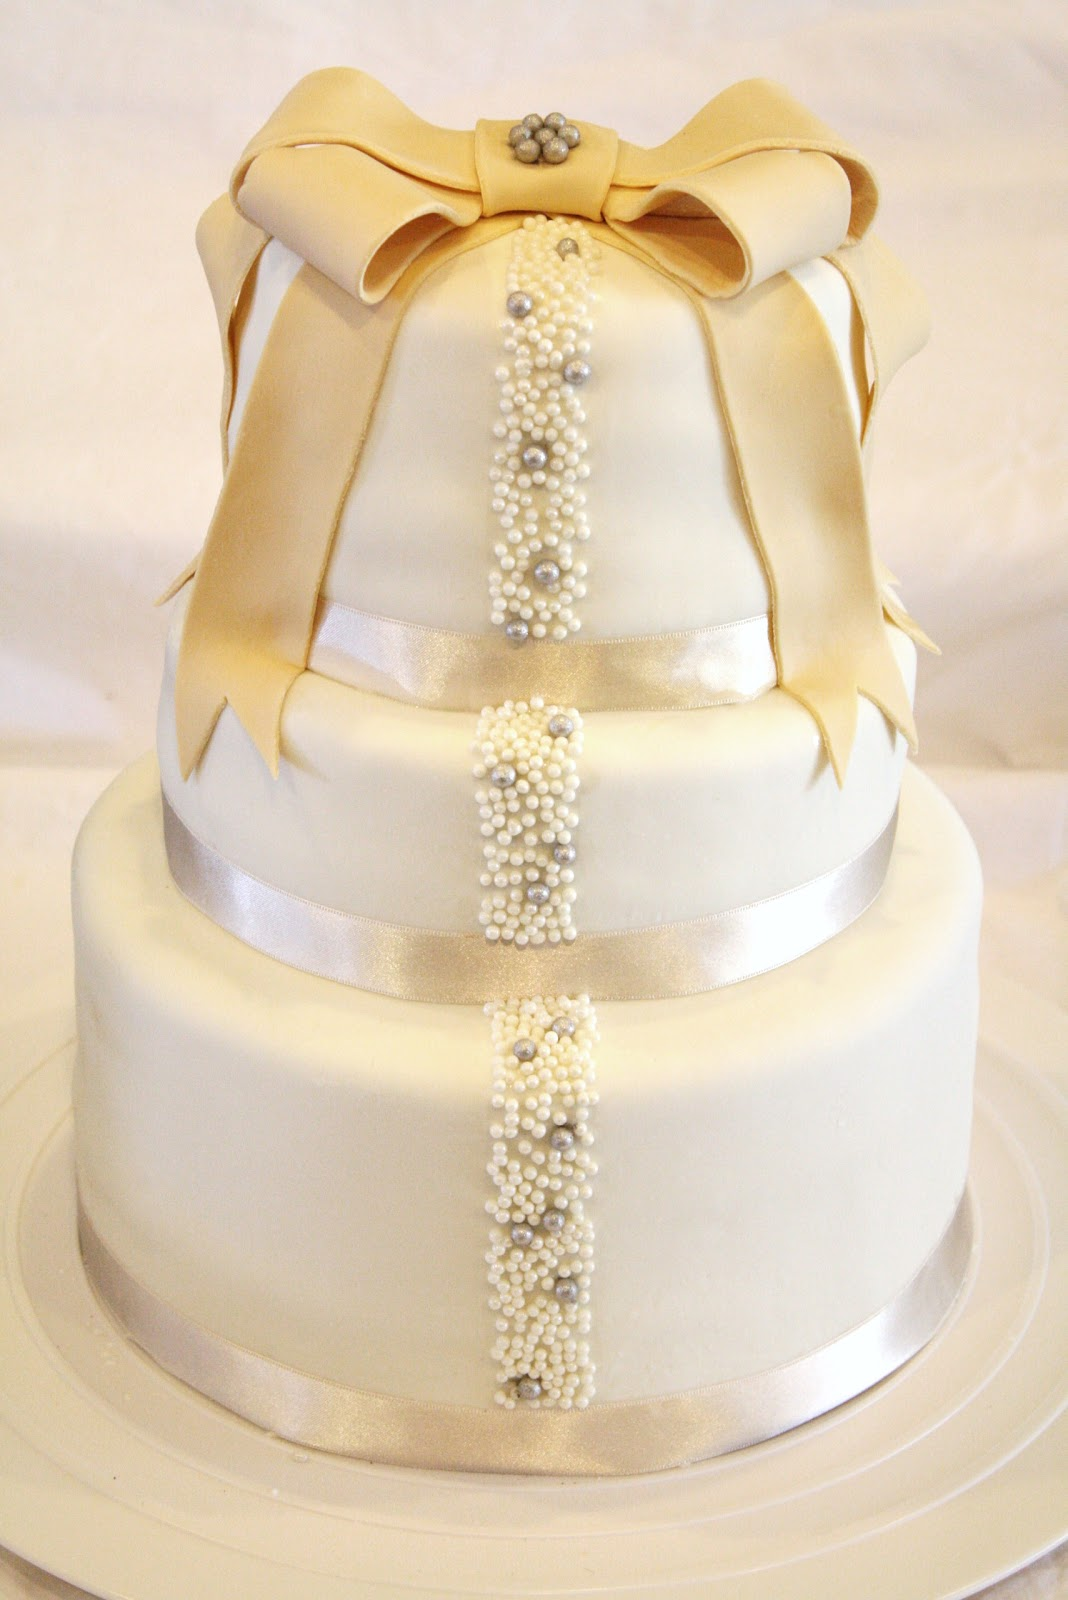 Sweet & Sassy Cakes Ivory and Pearl Wedding Cake